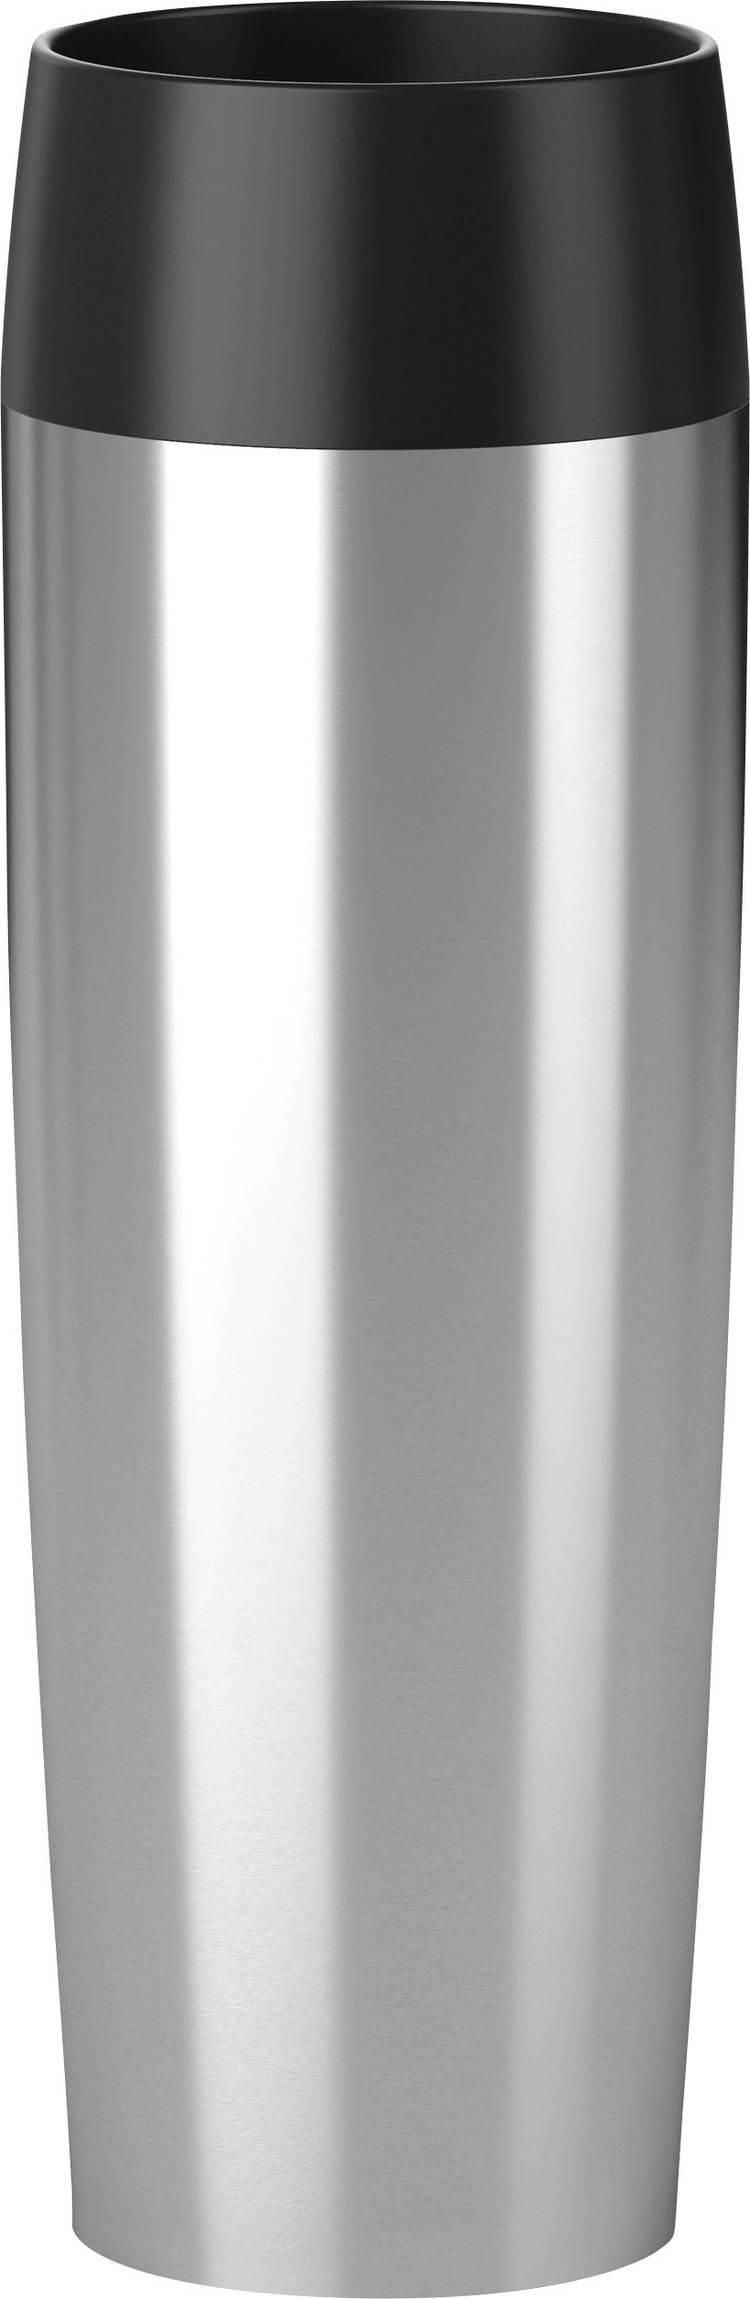 Image of Emsa-thermosbeker Travel Mug Grande, 0,5 liter, RVS